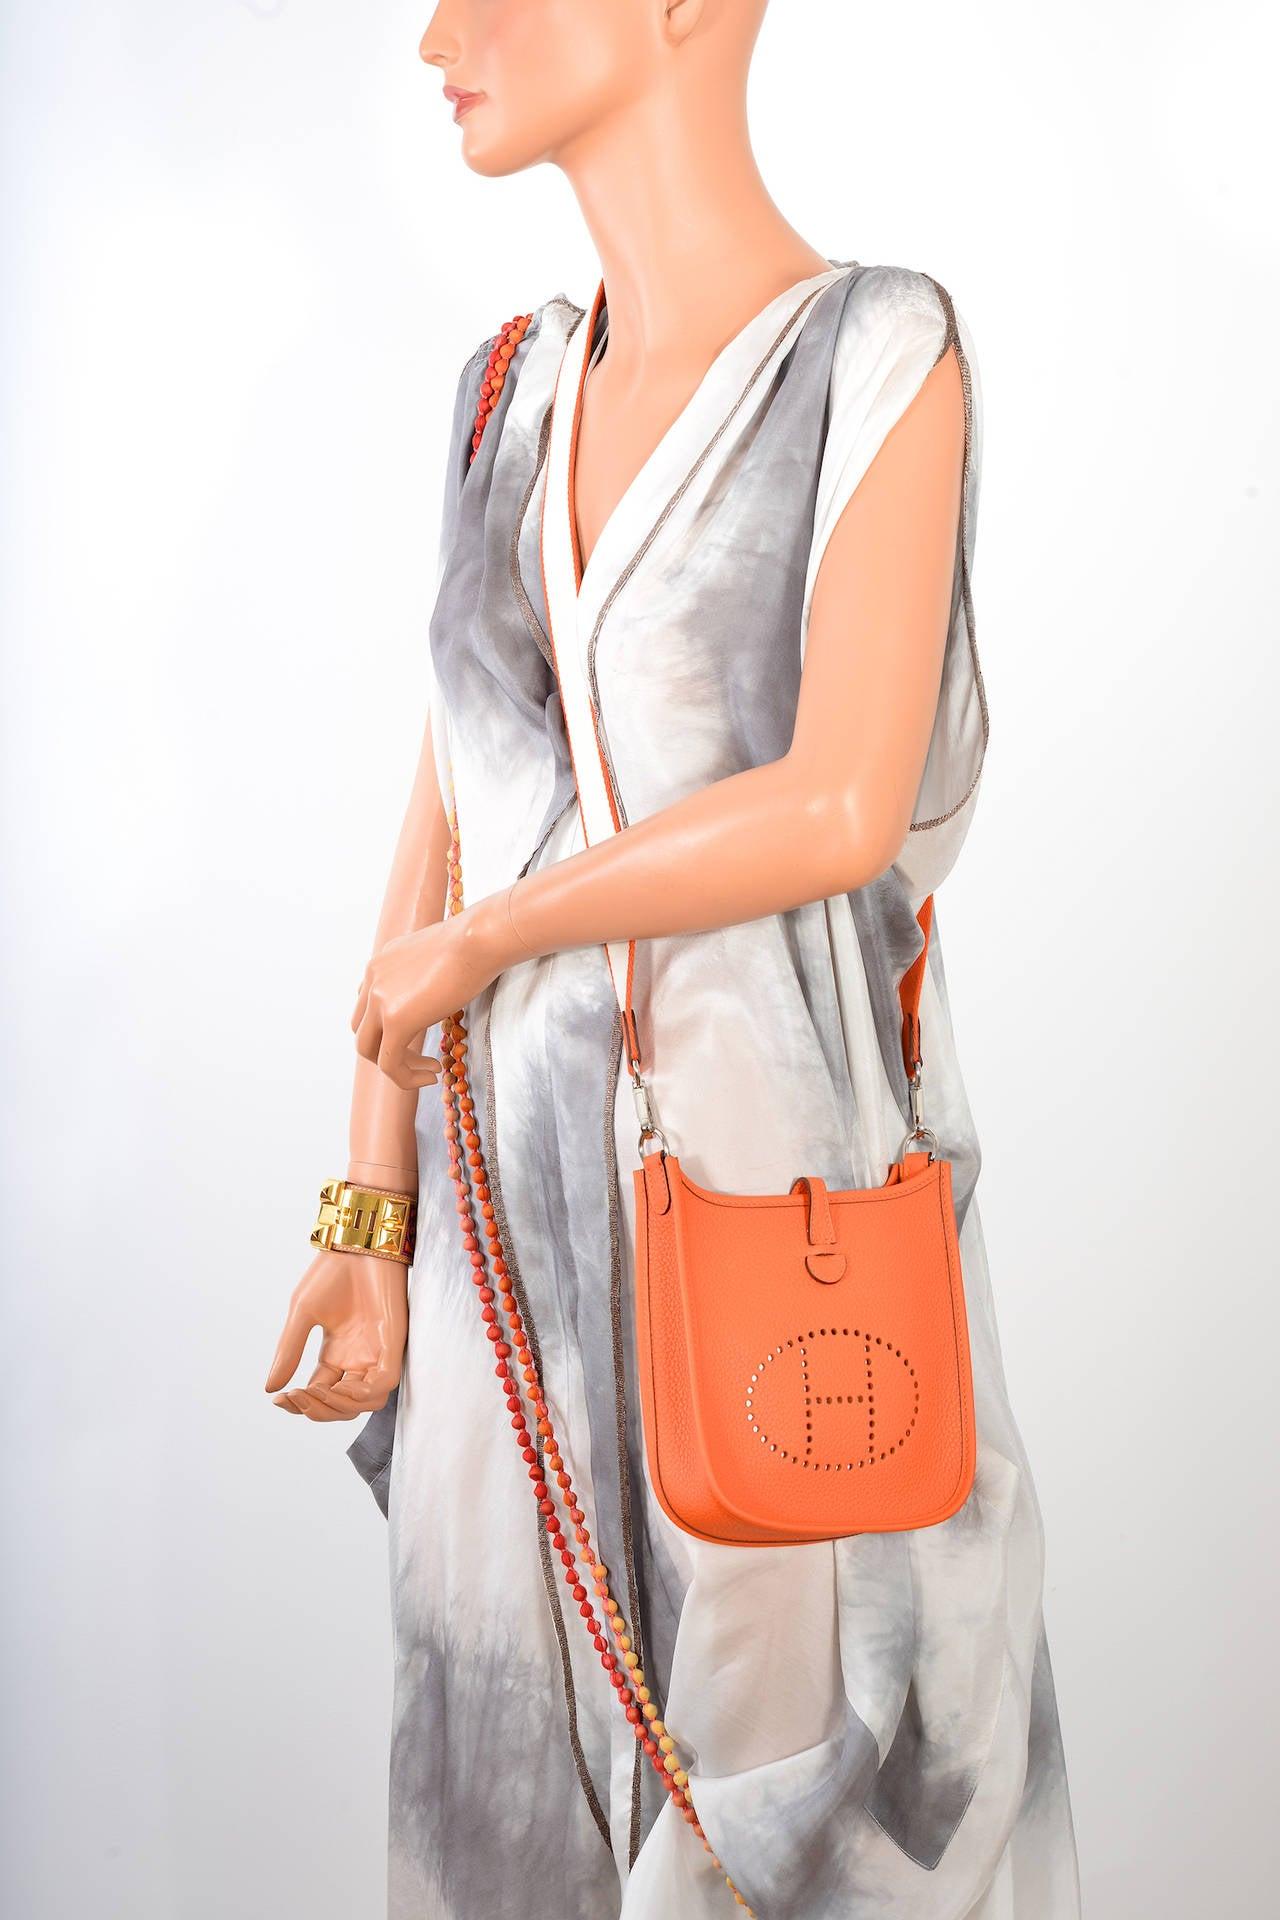 replica birkin handbags - HERMES EVELYNE TPM MINI HOT ORANGE WITH REMOVABLE AMAZONE STRAP ...